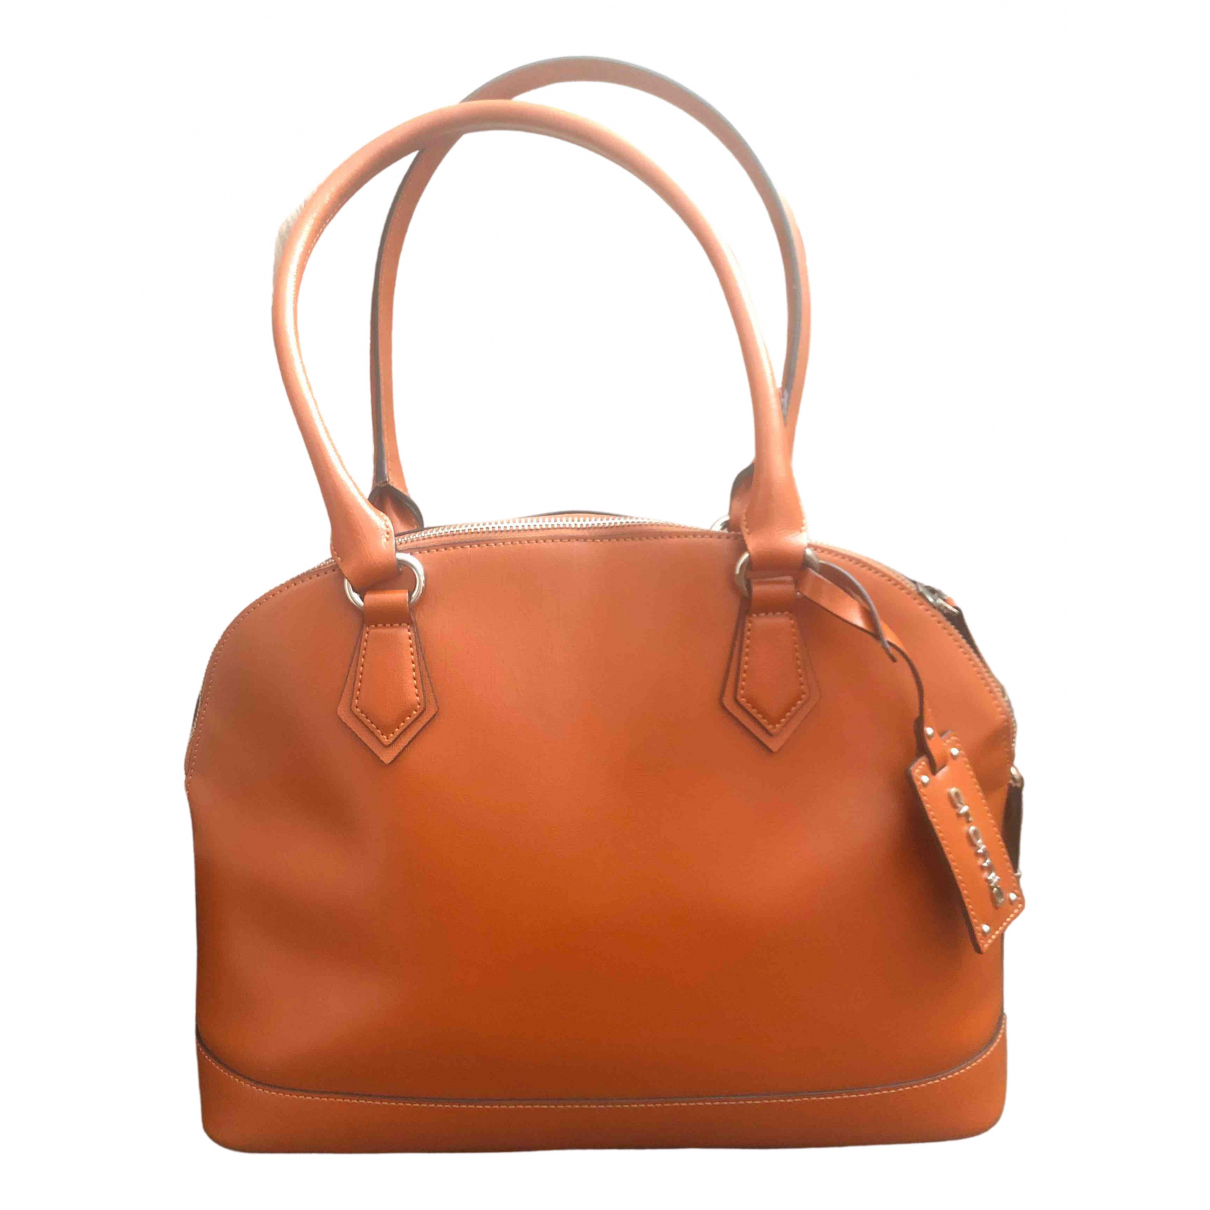 Cromia \N Orange Leather handbag for Women \N